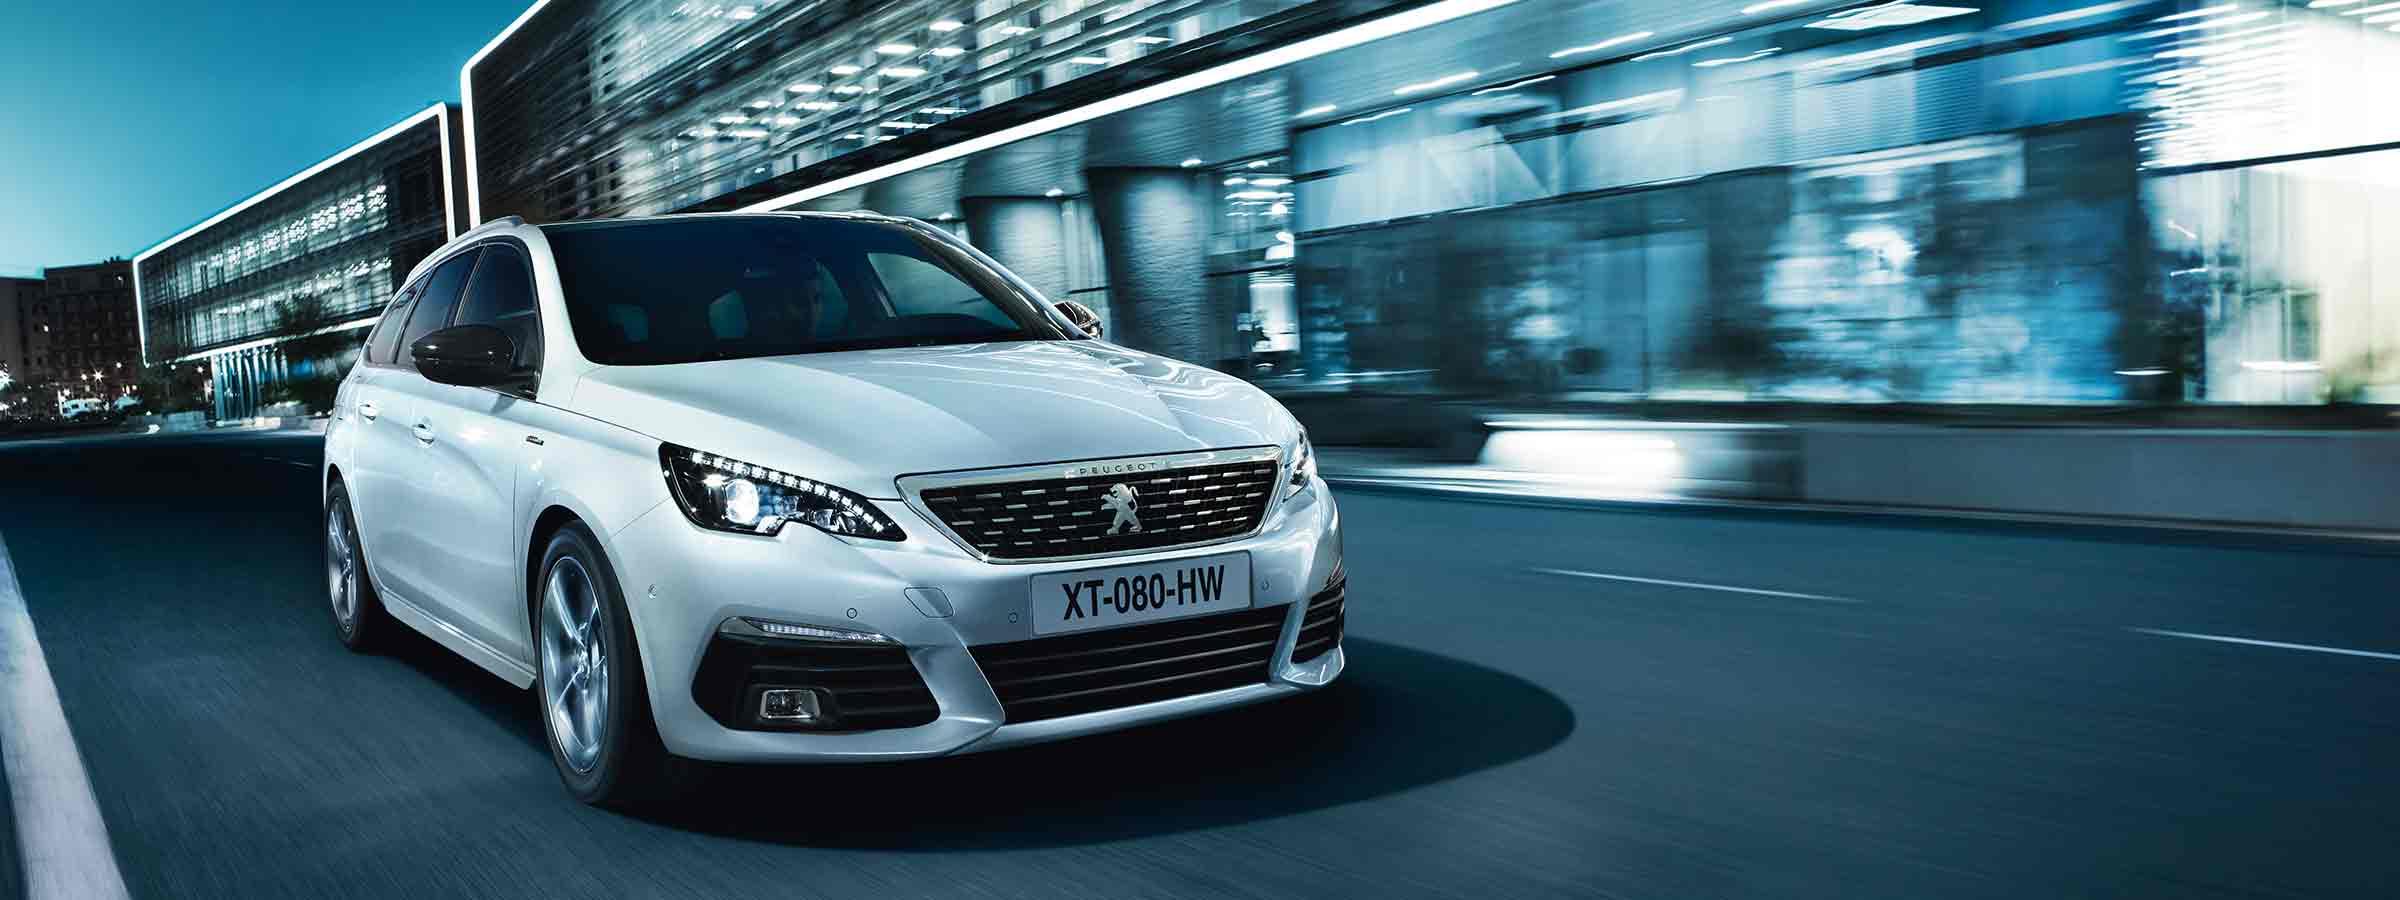 Peugeot Probefahrt Leasing Verkauf